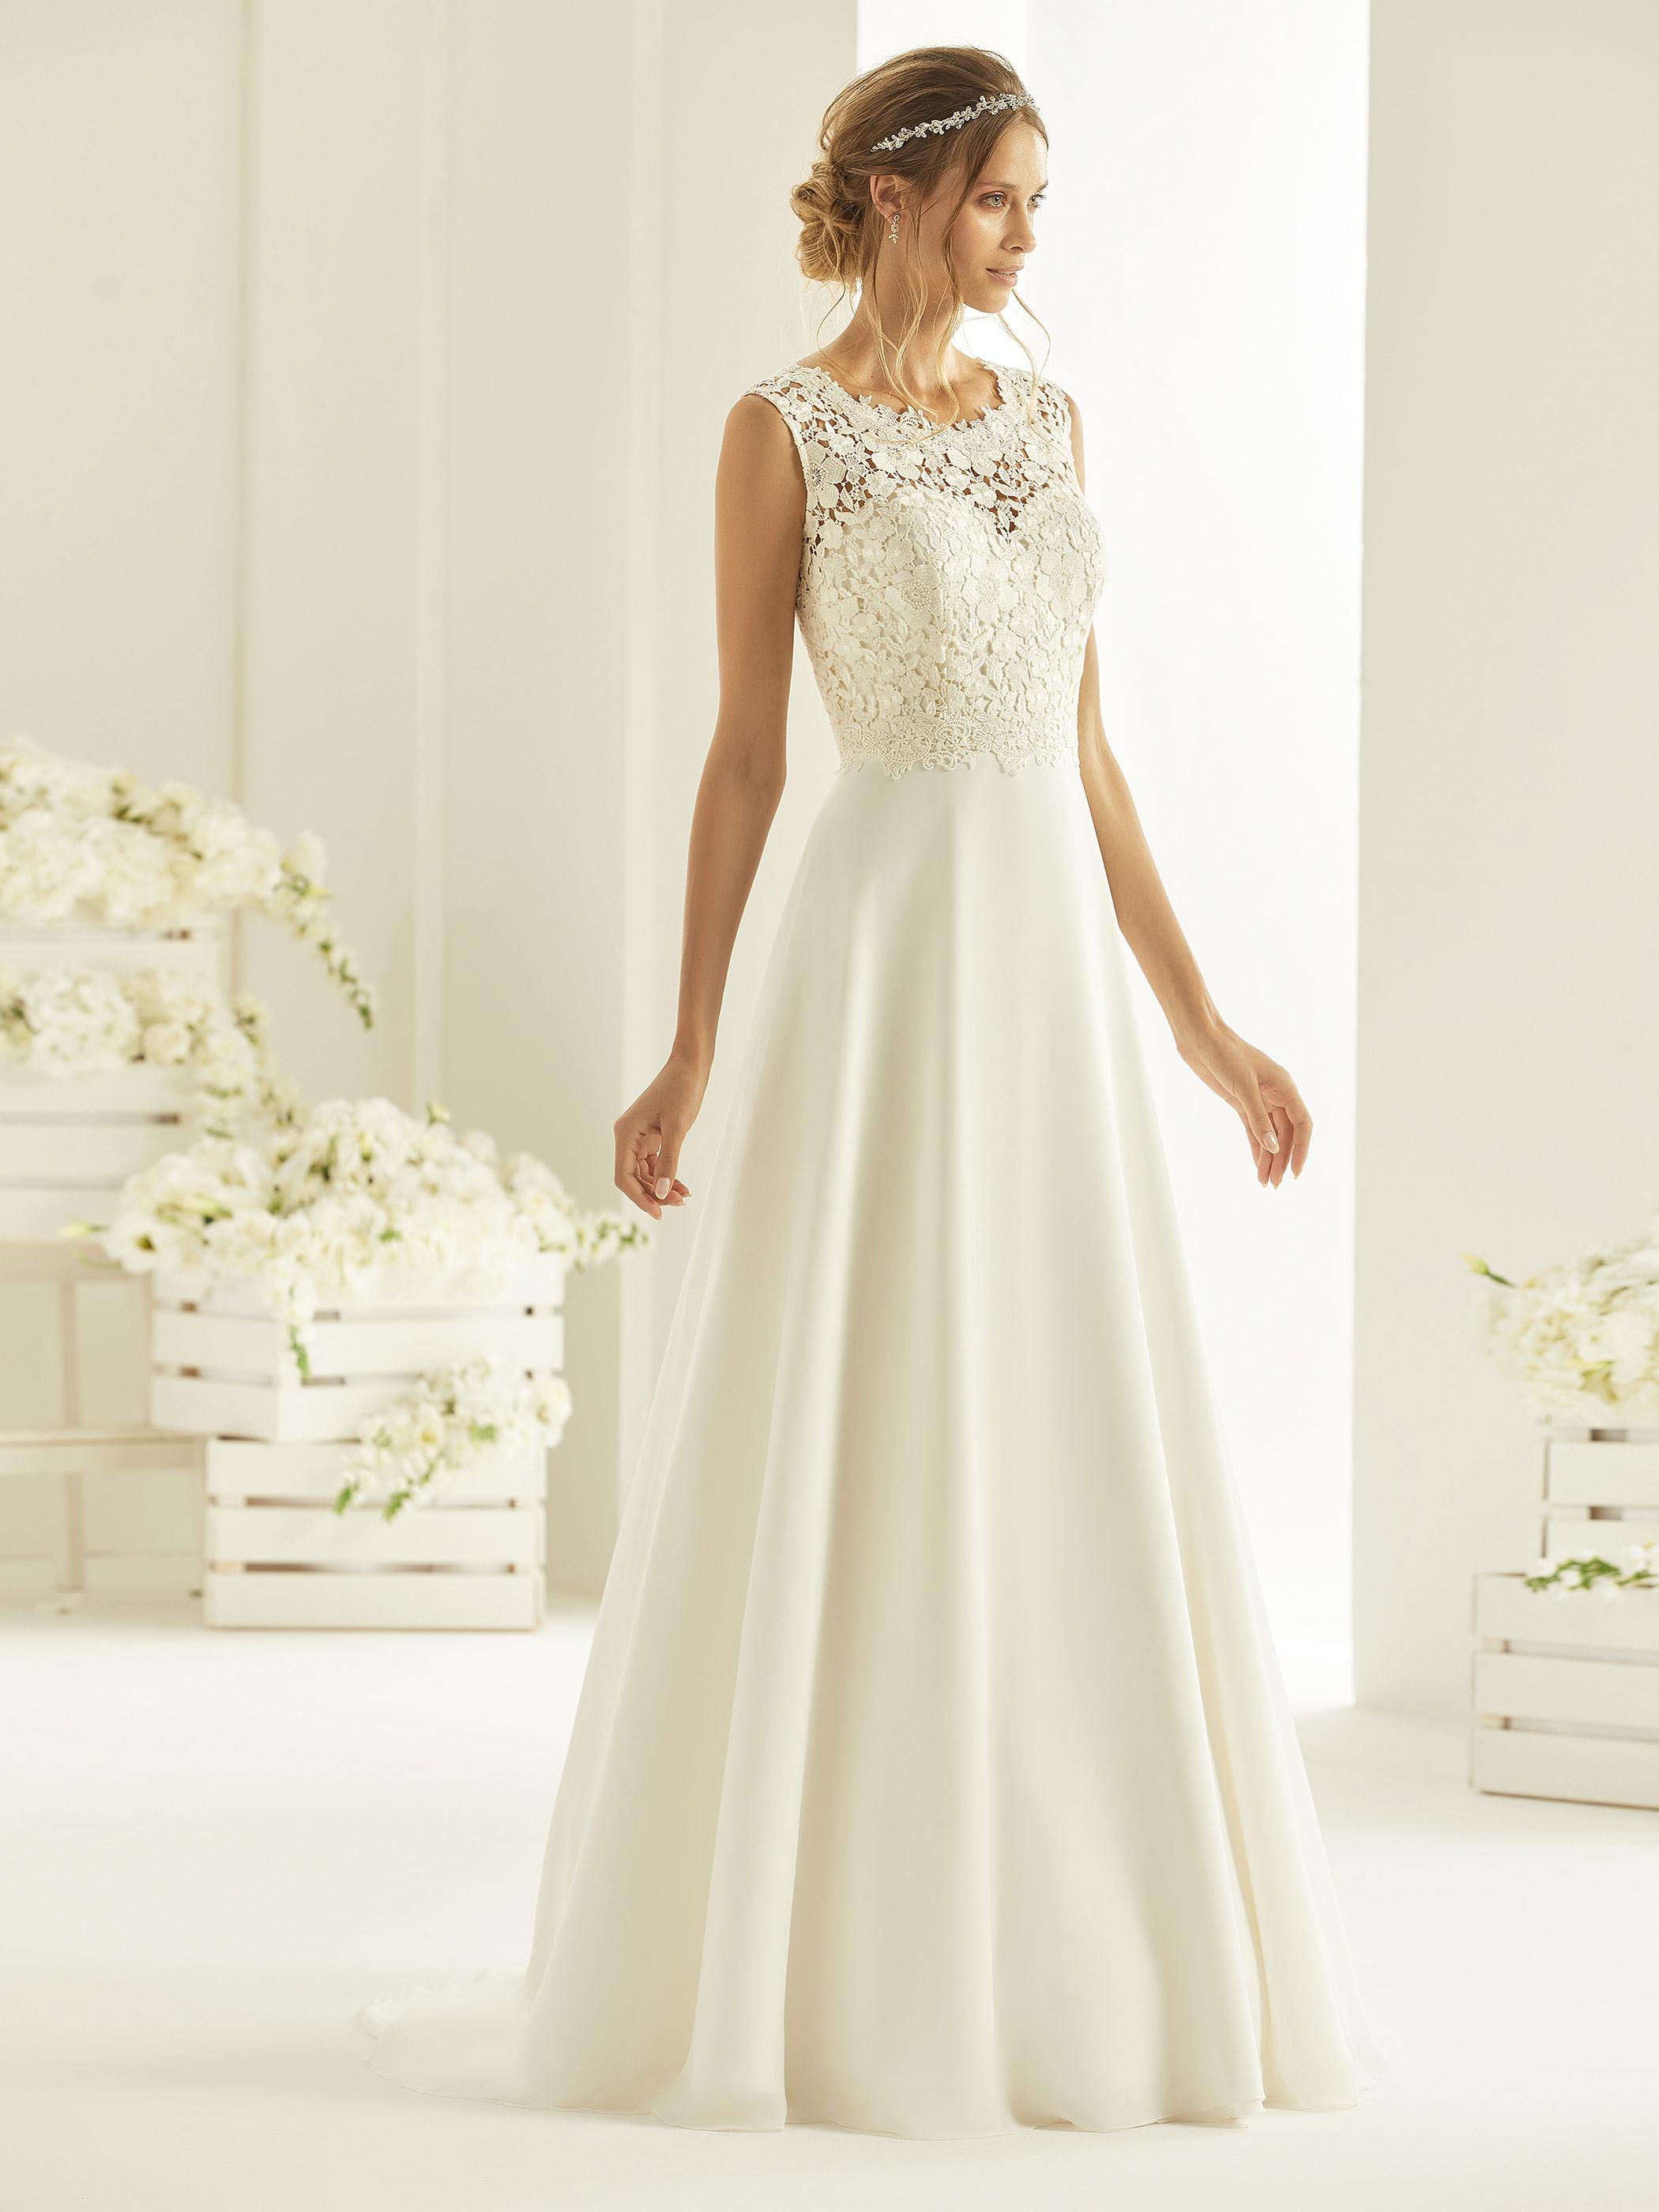 JOSEPHINE-(1) Bianco-Evento-bridal-dress